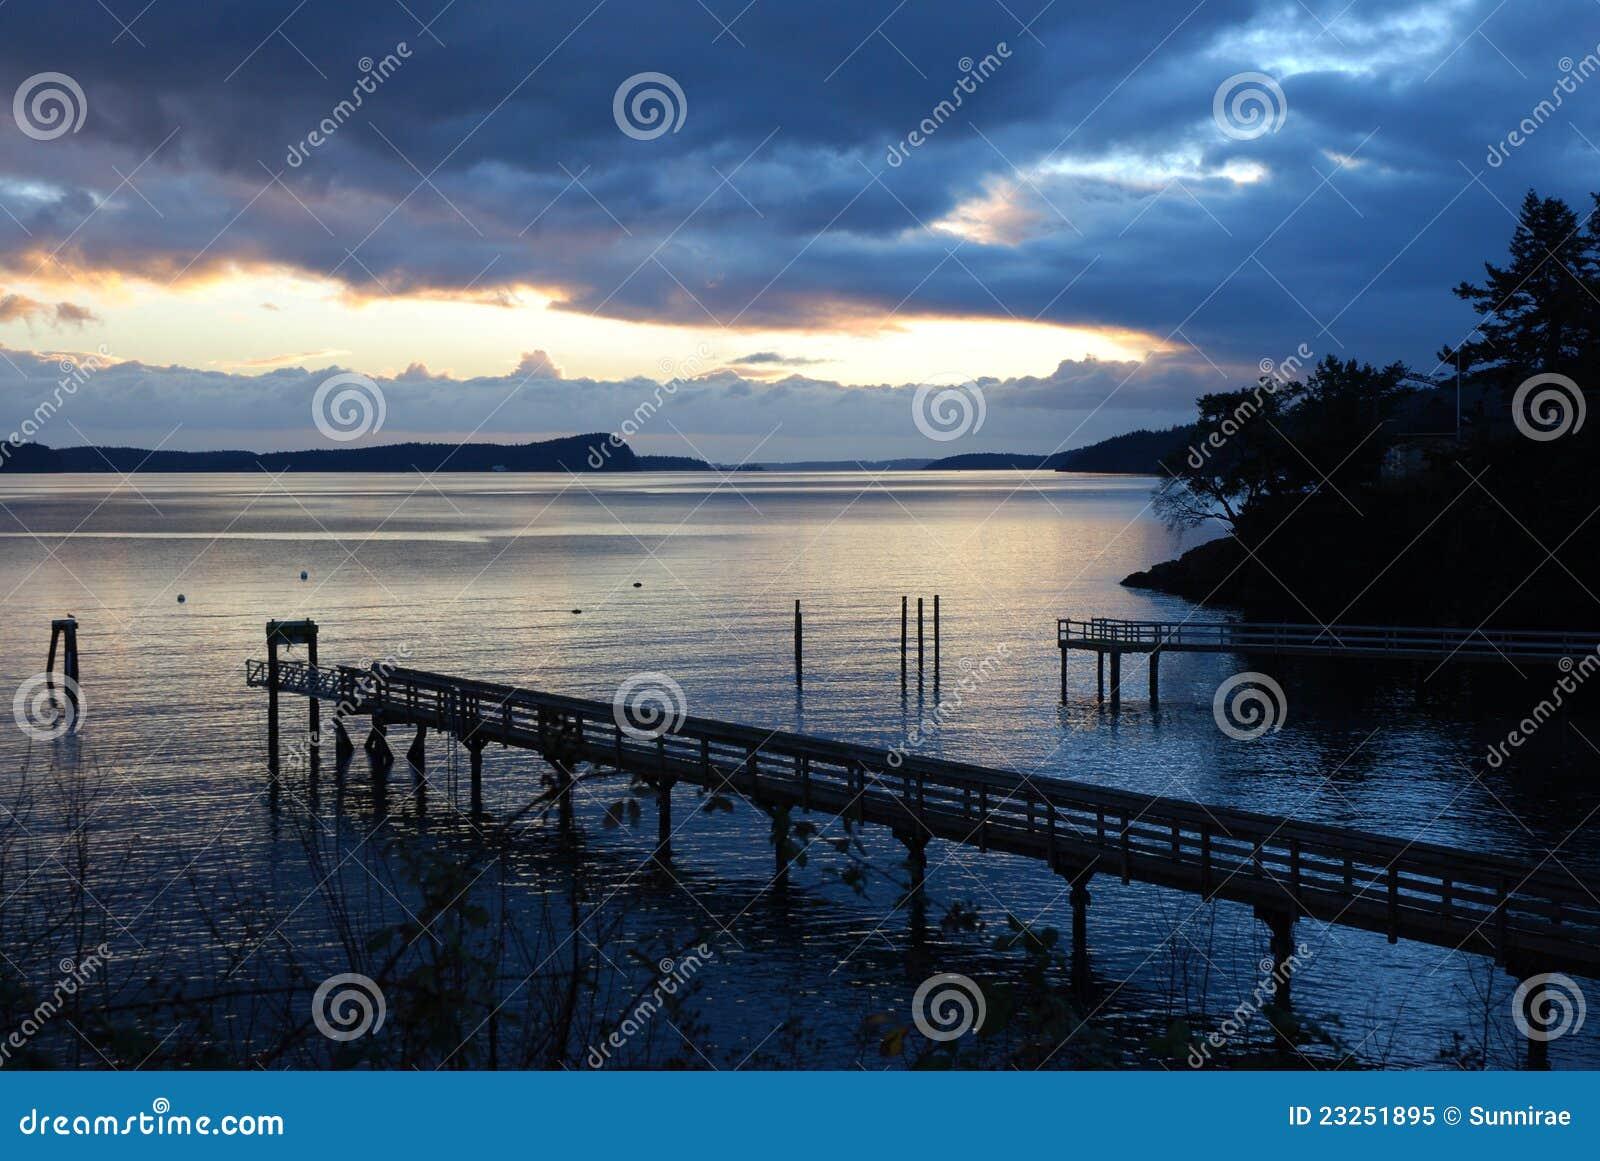 Twilight at Olga Dock on Orcas Island Washington